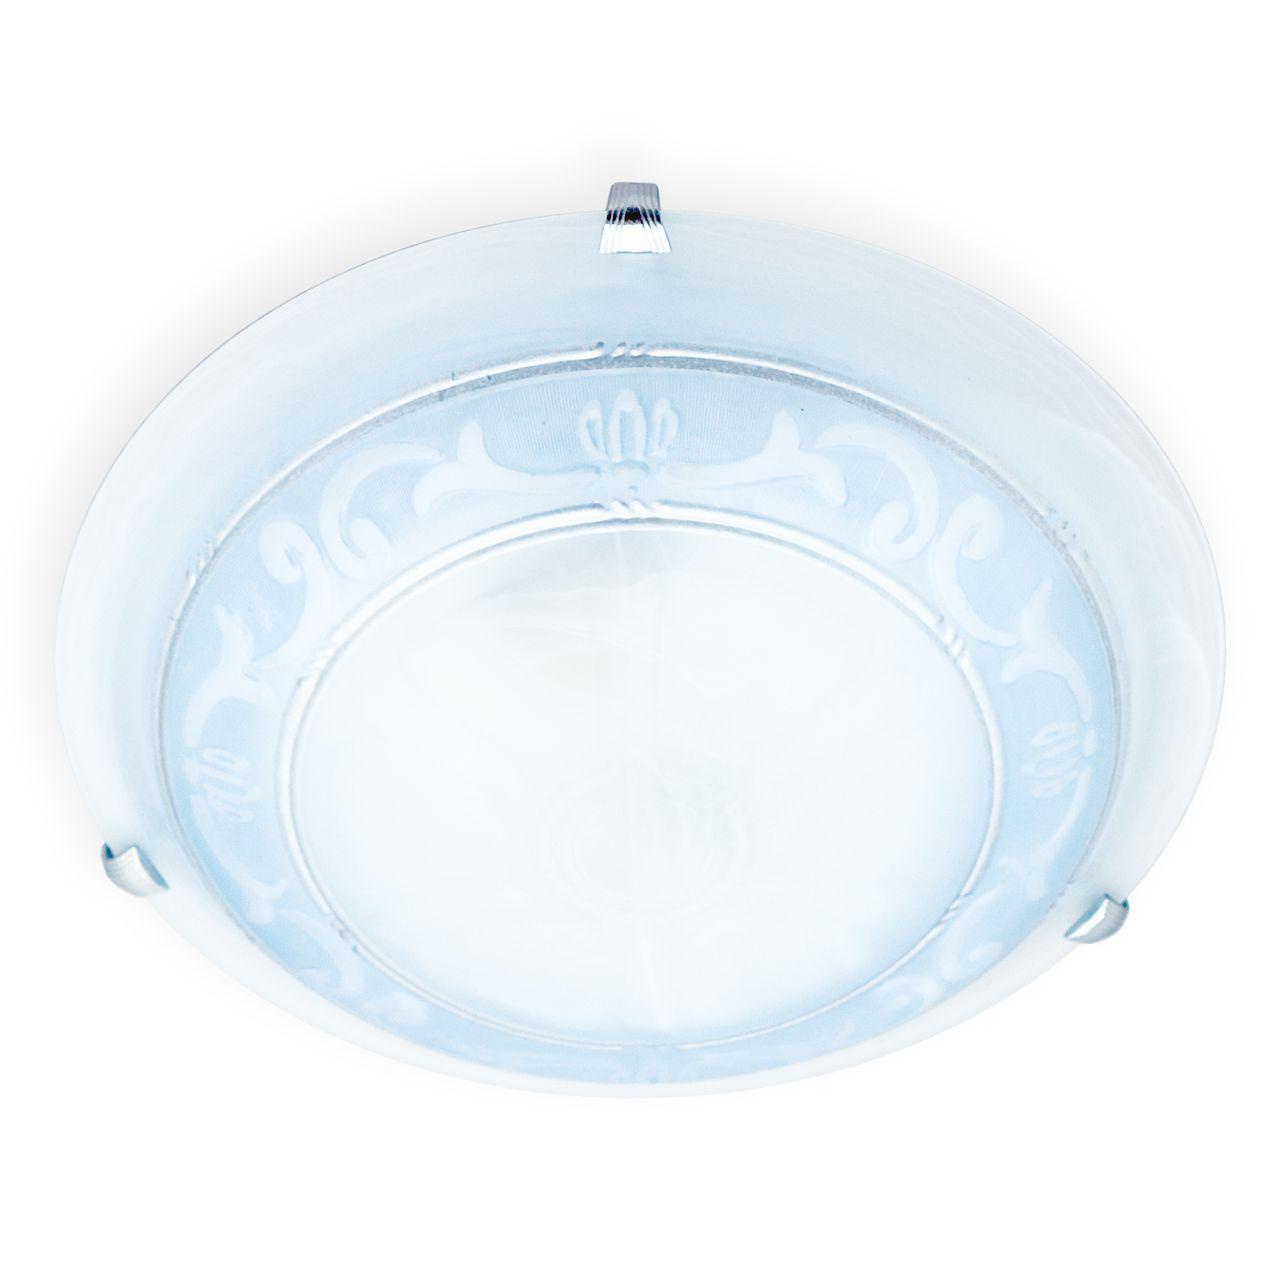 Настенно-потолочный светильник Toplight TL9091Y-02BL, голубой toplight tl9070y 01pn